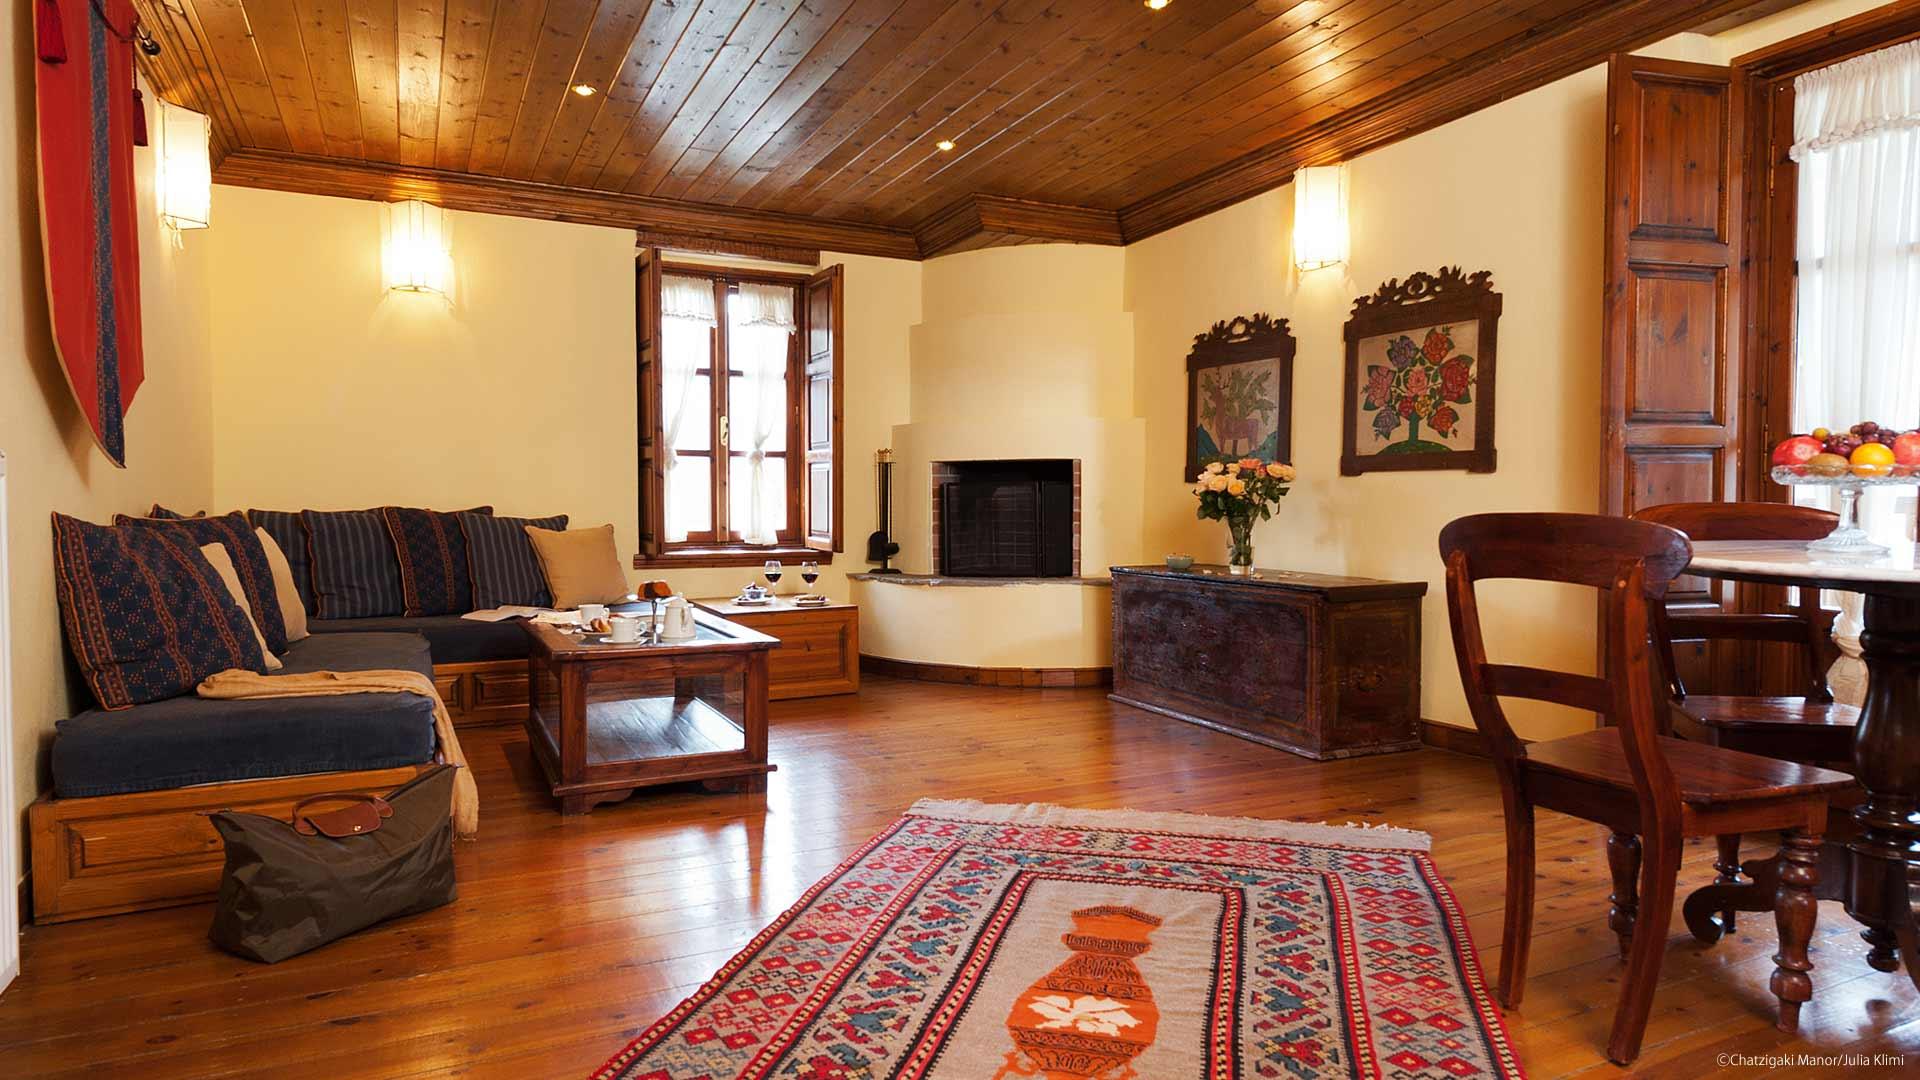 Garden Residence Suite στο ξενοδοχείο Αρχοντικό Χατζηγάκη στο Περτούλι